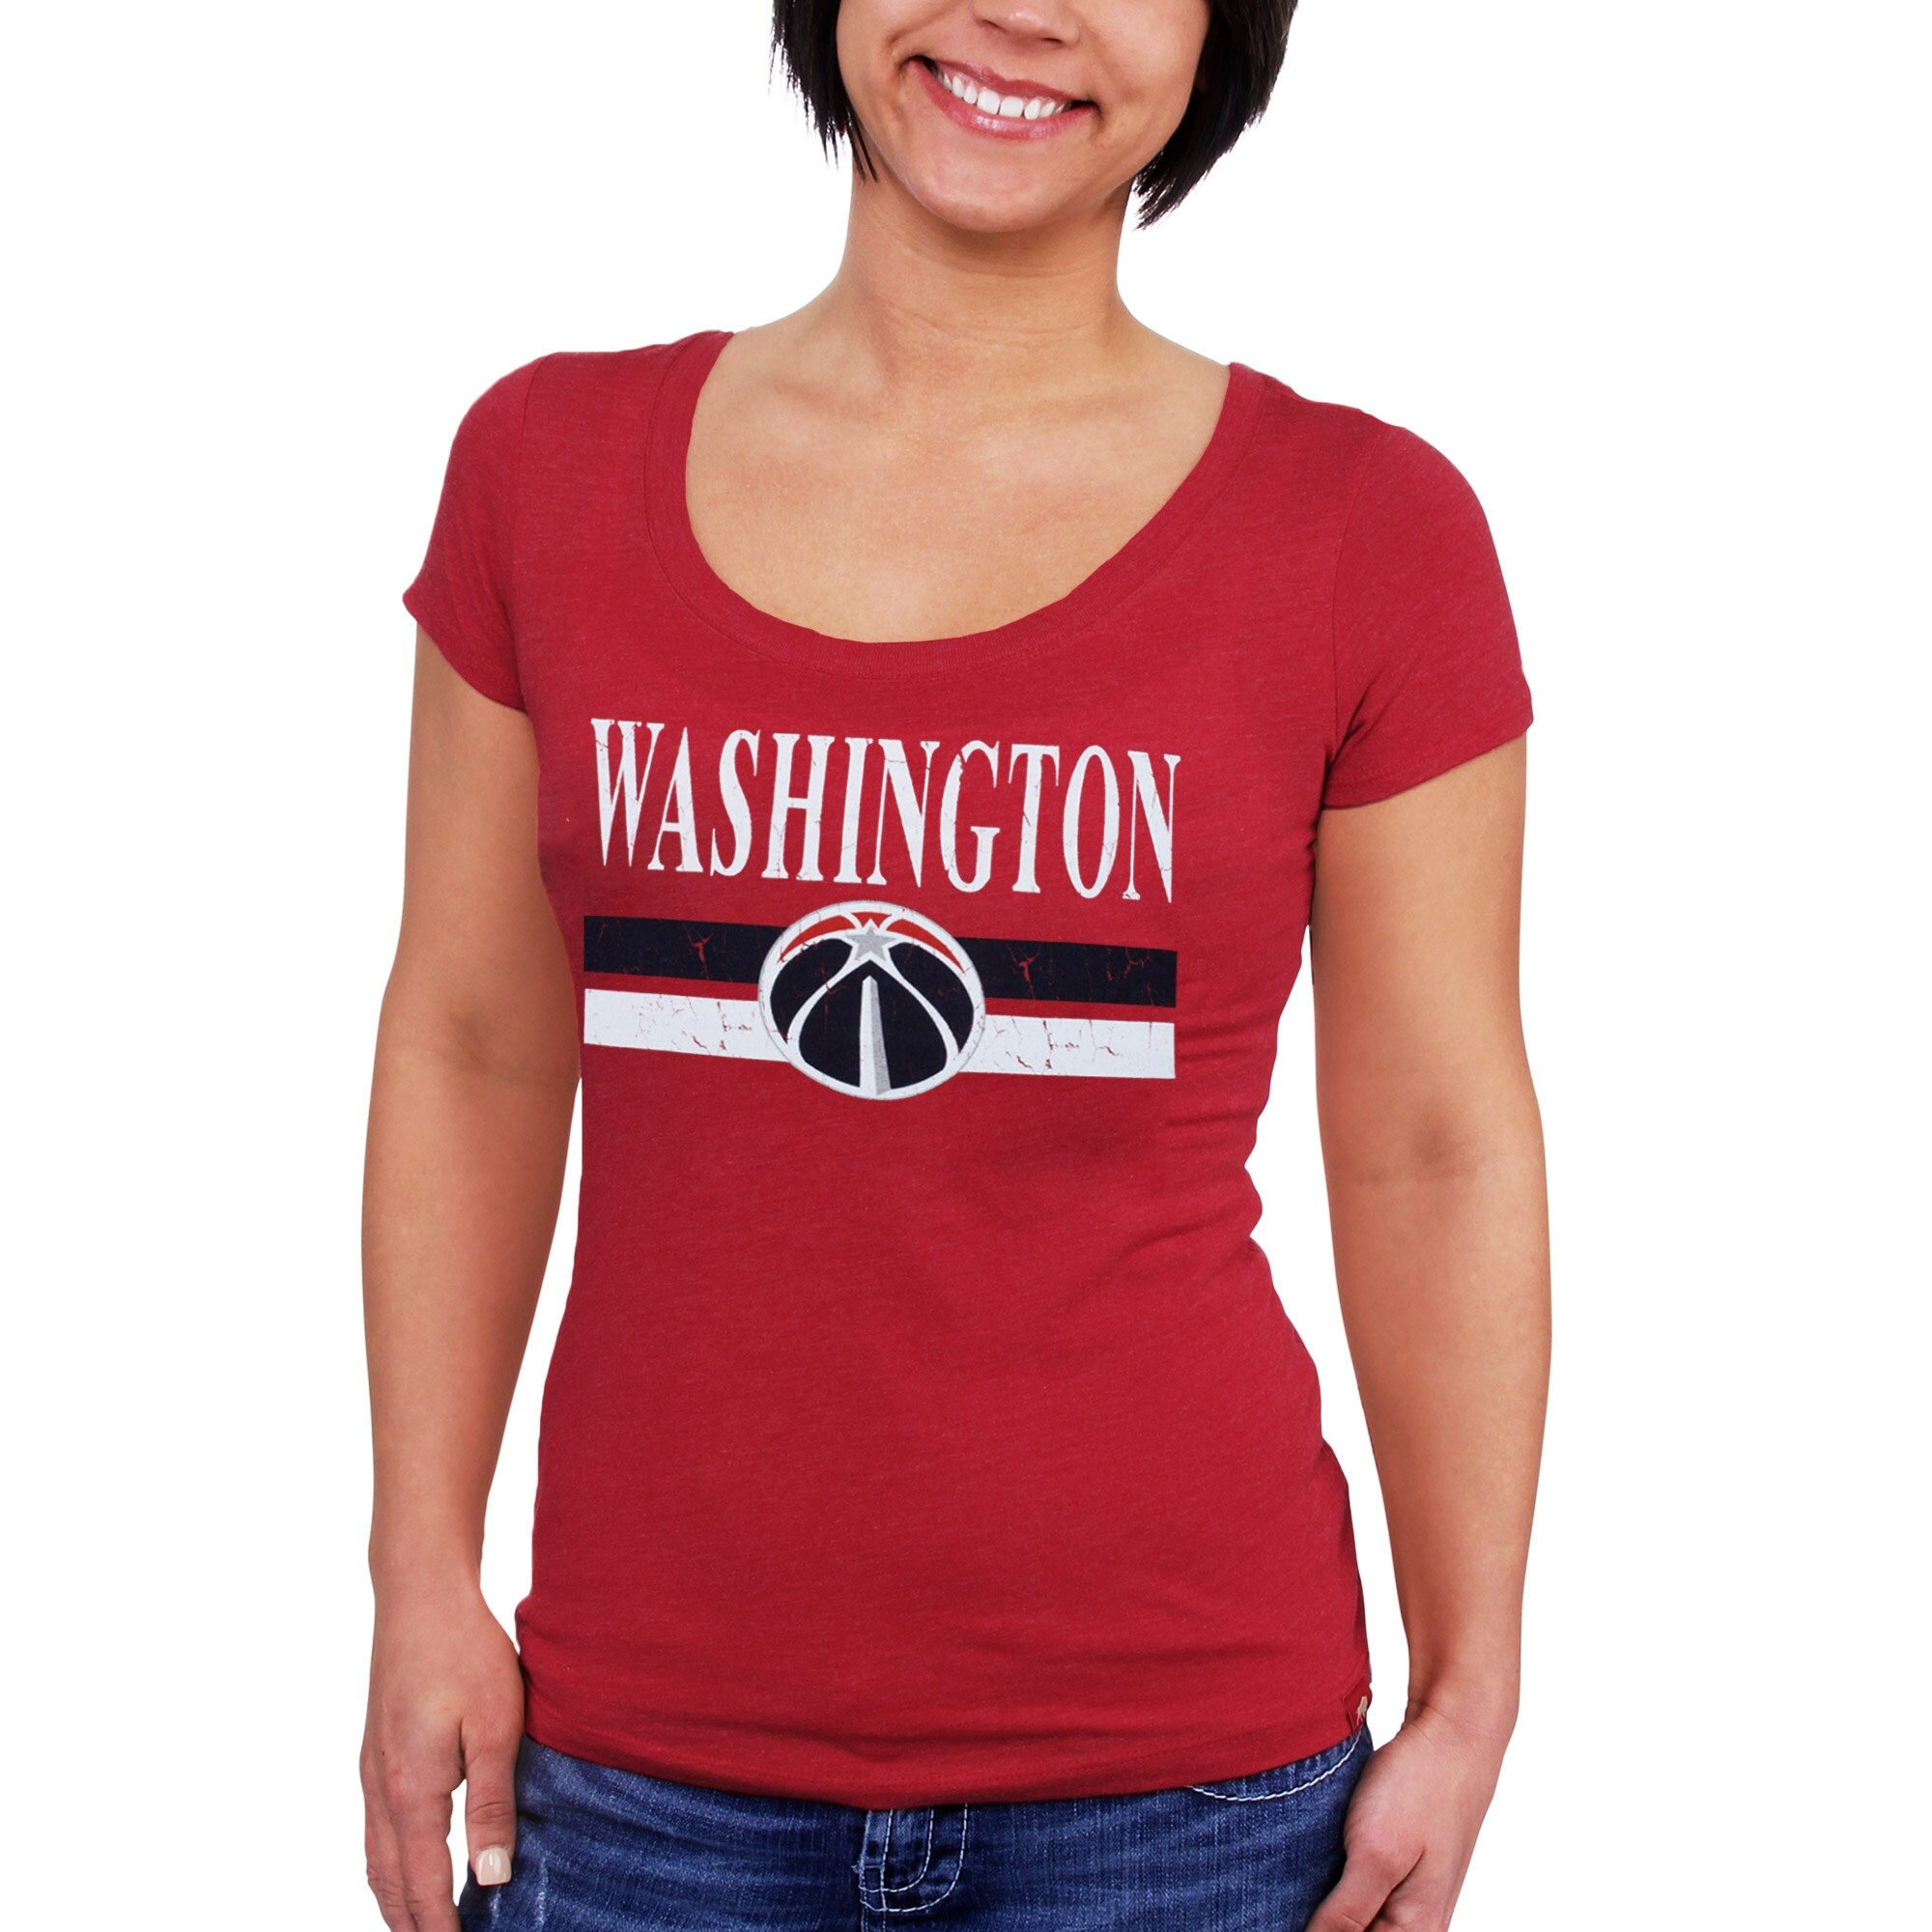 Washington Wizards Sportiqe Women's Cosmo Tri-Blend Scoop Neck T-Shirt - Red